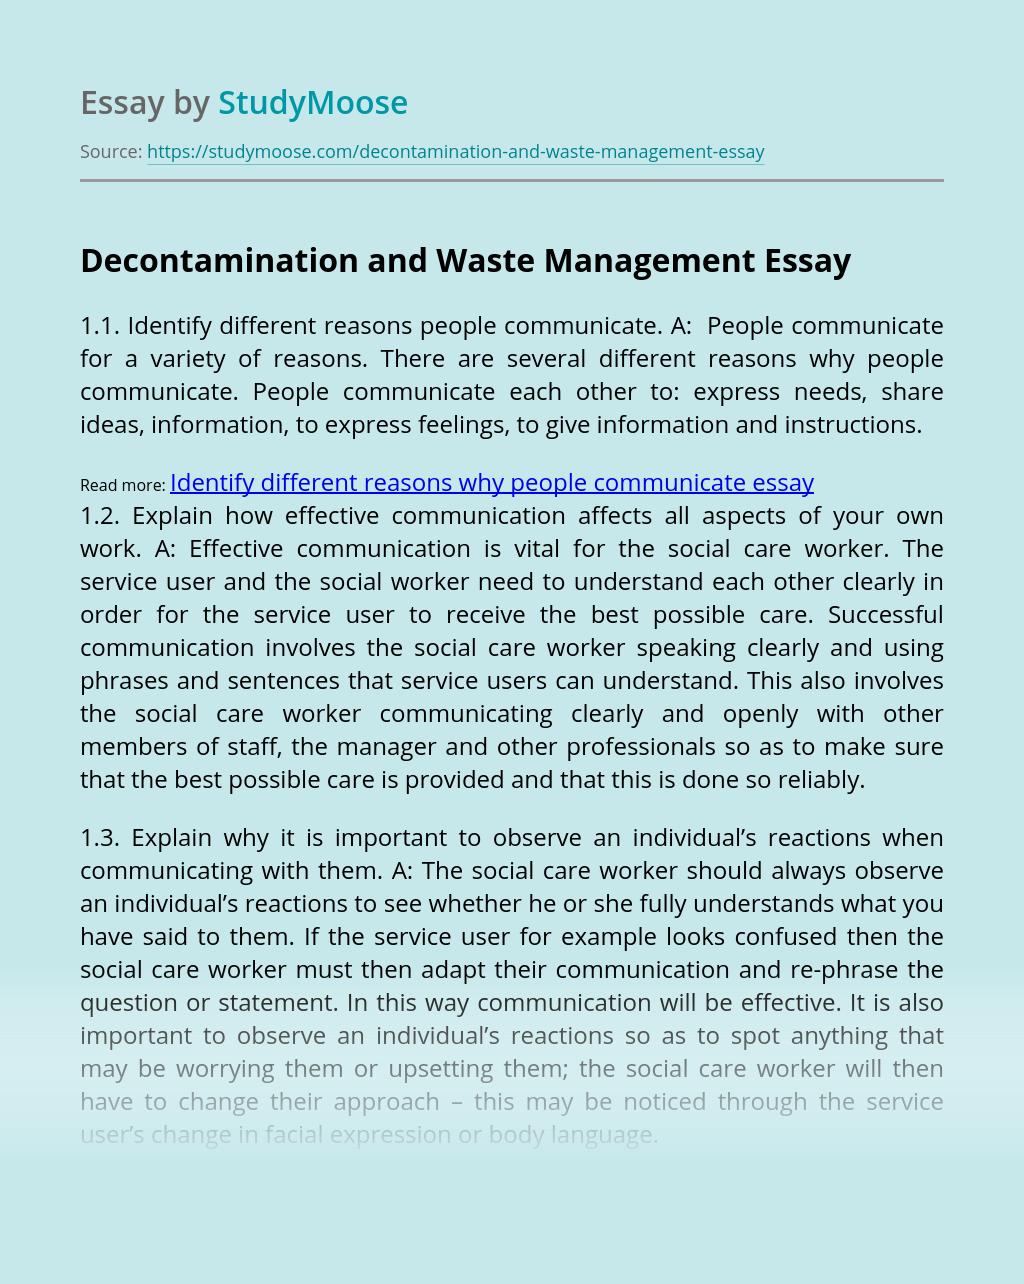 Decontamination and Waste Management